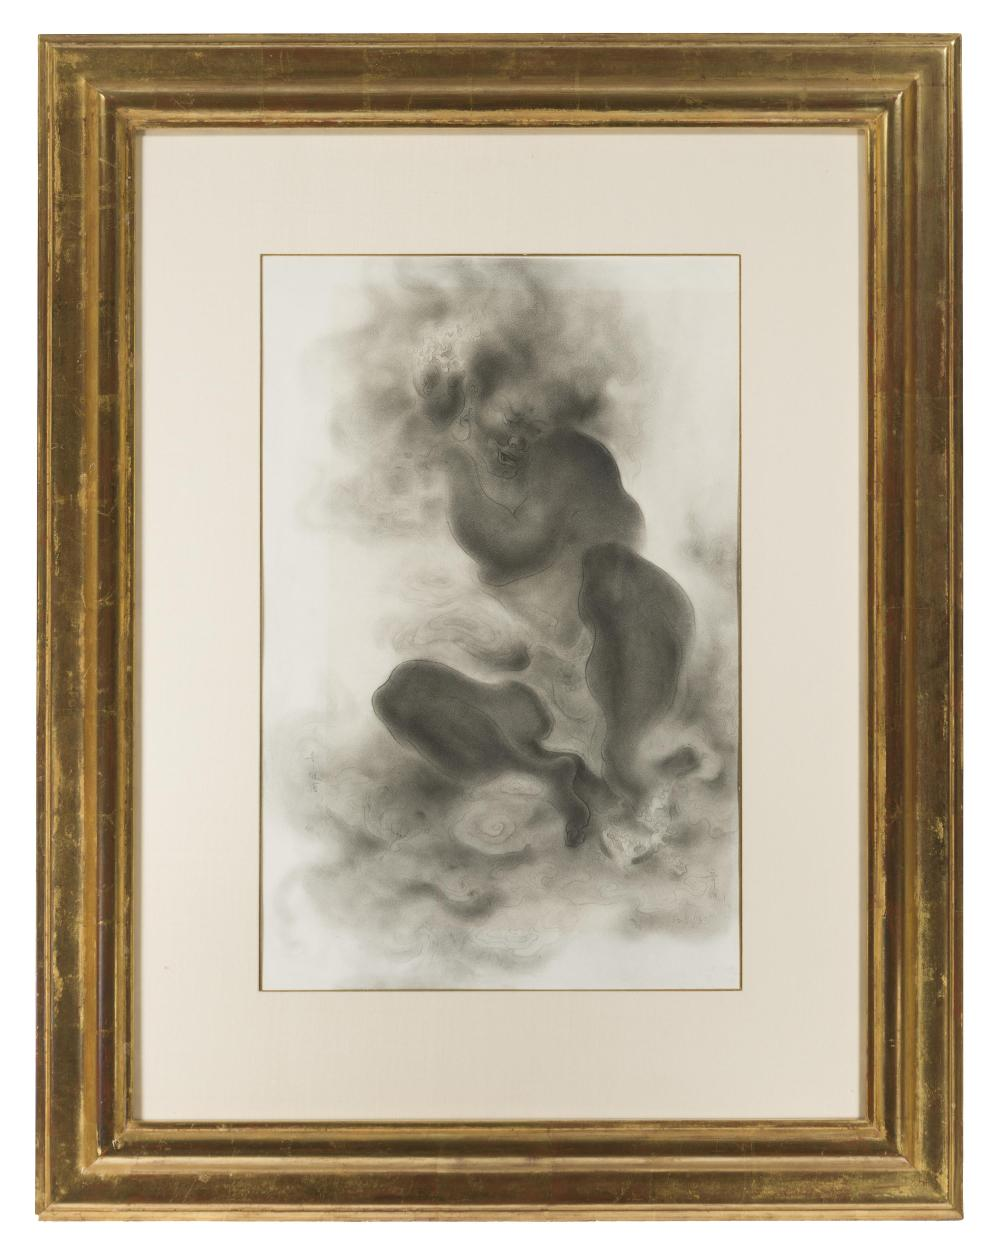 Stanton MacDonald-Wright, (1890-1973 Santa Monica, CA),